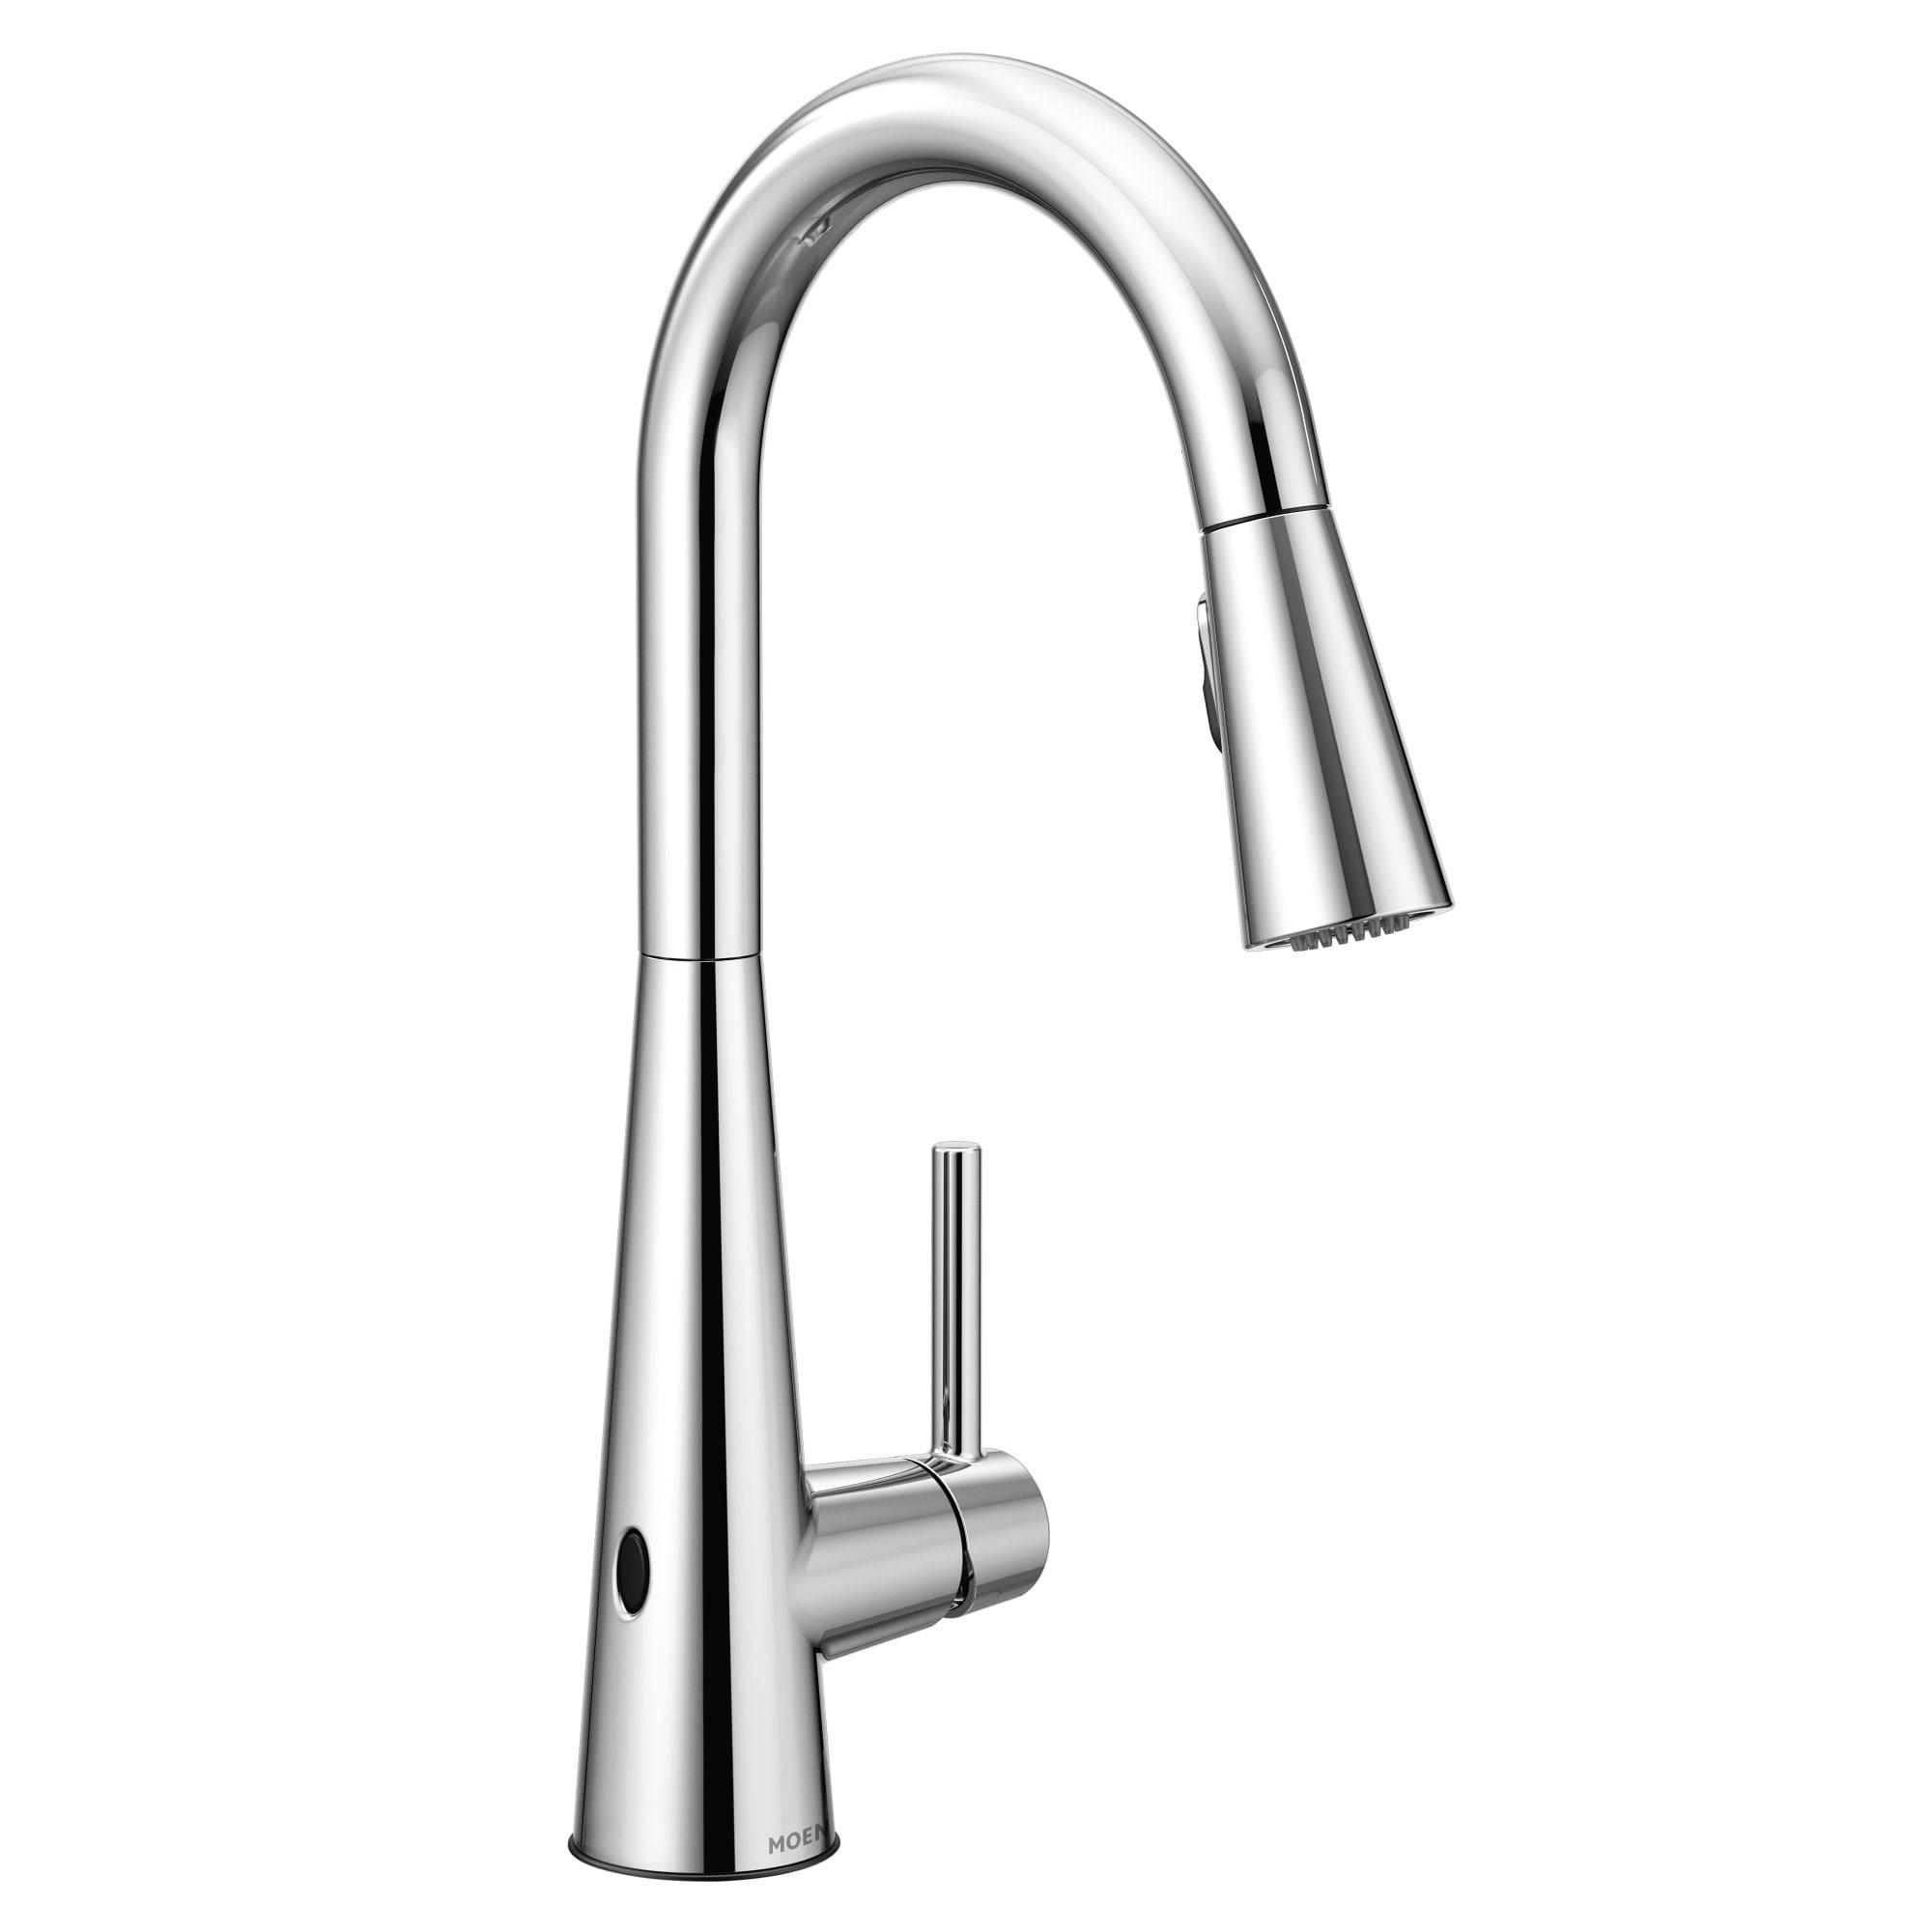 Moen 7864EW Sleek 1.5 GPM Pull Down High Arc Kitchen Faucet With  MotionSense, Power